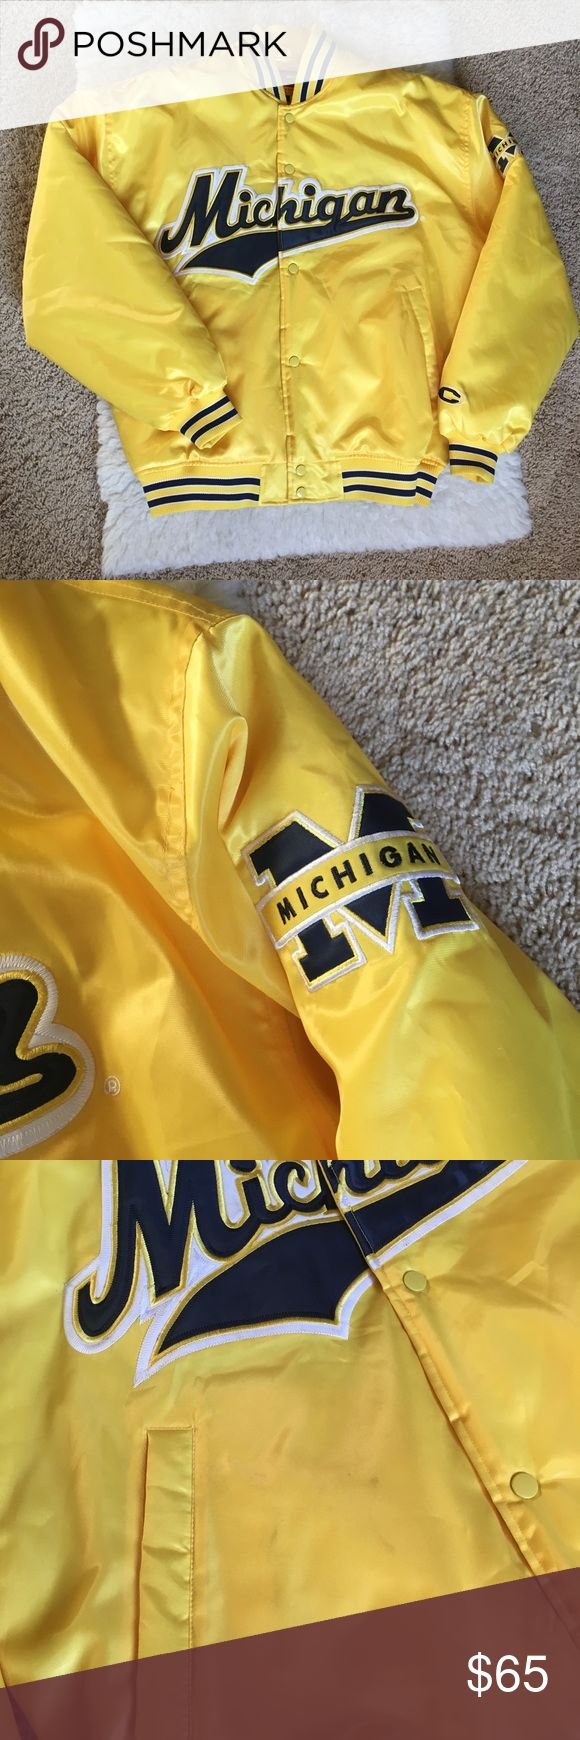 "Michigan Wolverines Football Jacket Michigan Wolverines Football Jacket Size Large Color: Yellow Style: Bomber / Varsity Brand: Colosseum Sportswear Says ""Michigan"" on the sleeve Colosseum Jackets & Coats Bomber & Varsity"